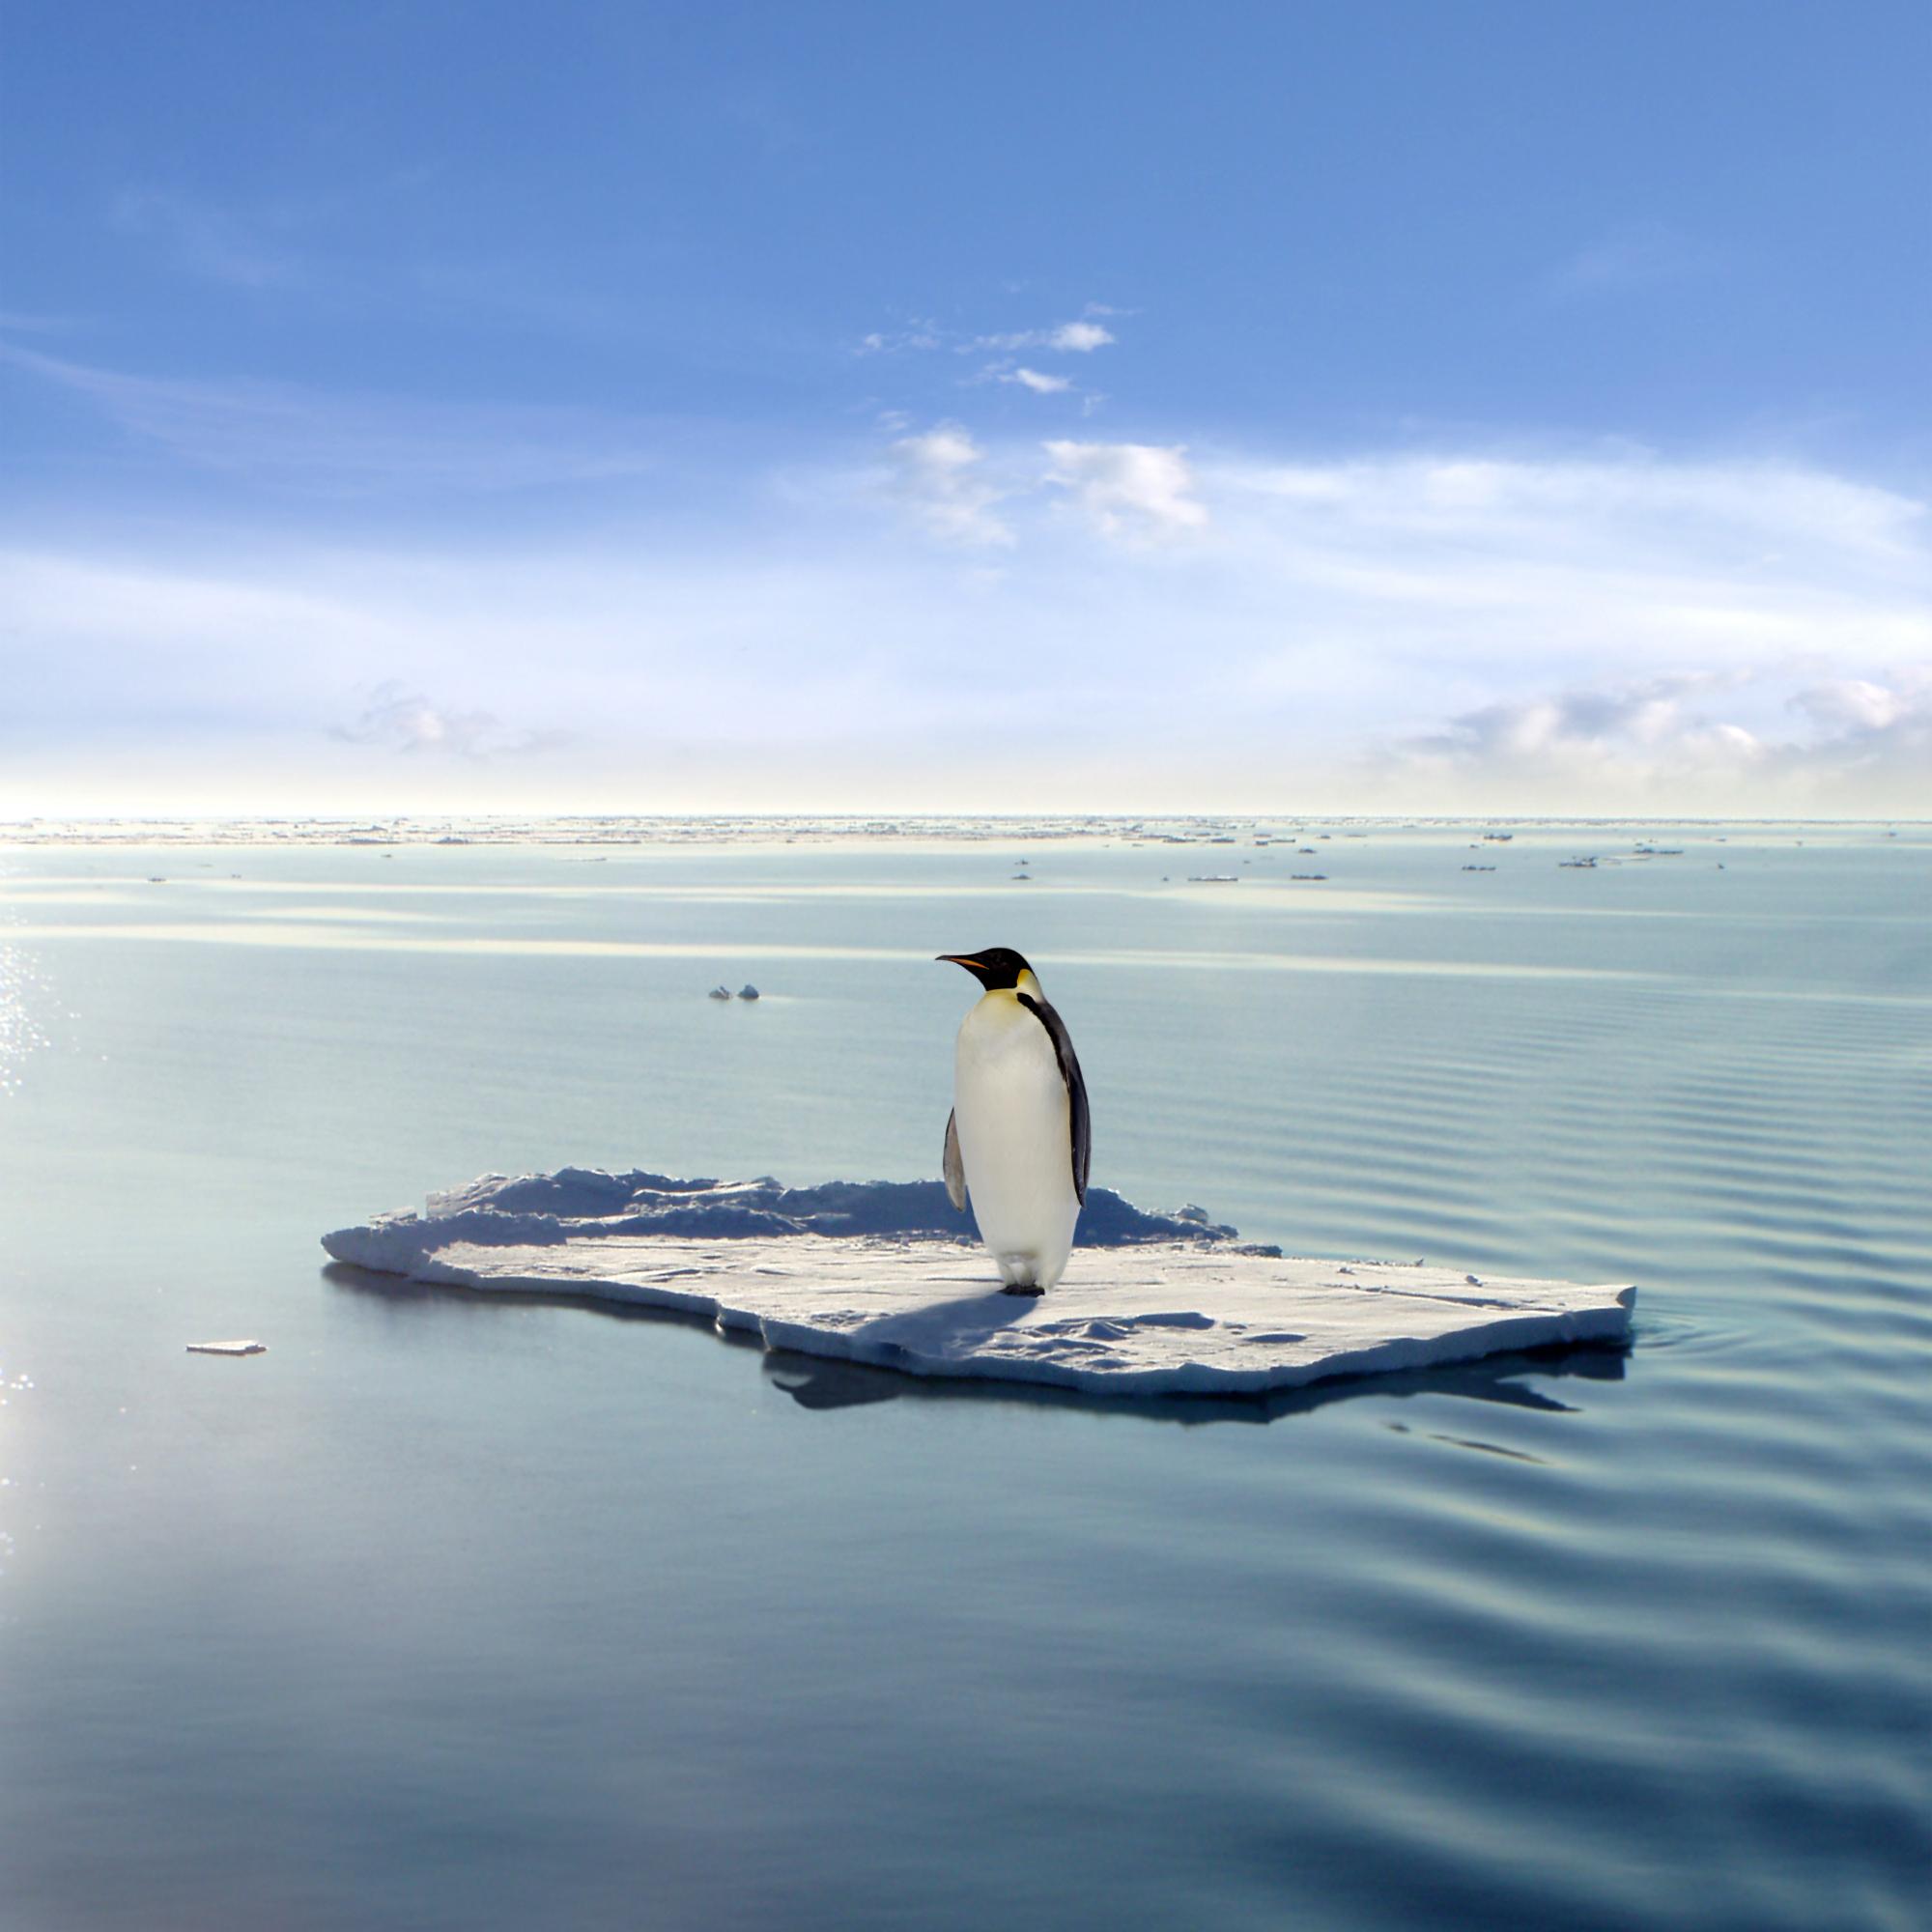 Penguin on ice block_shutterstock_3784216